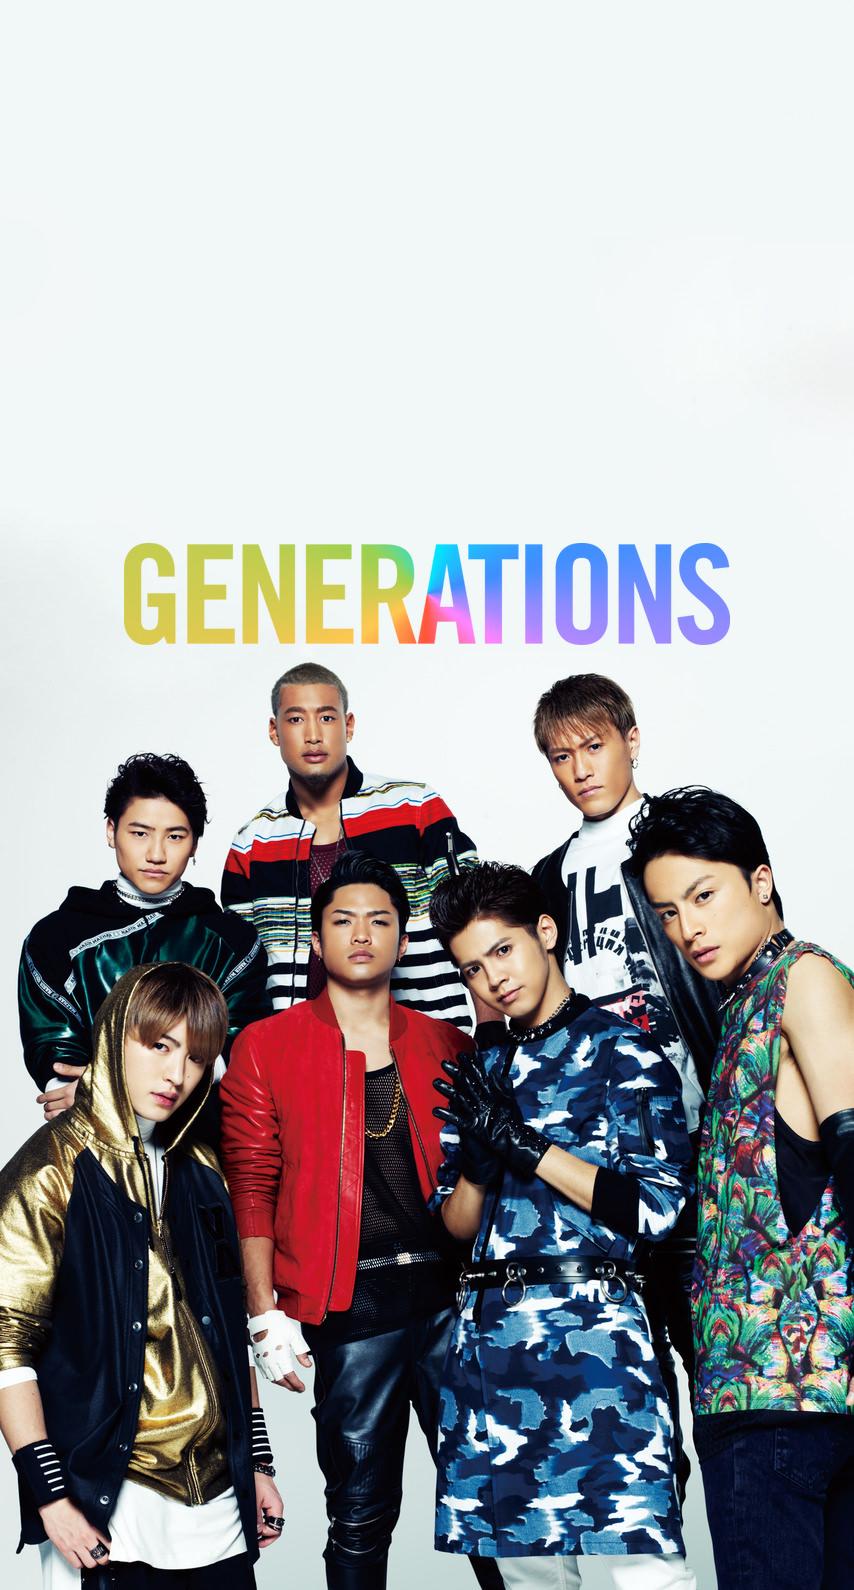 GENERATIONSメンバー&レインボーロゴ